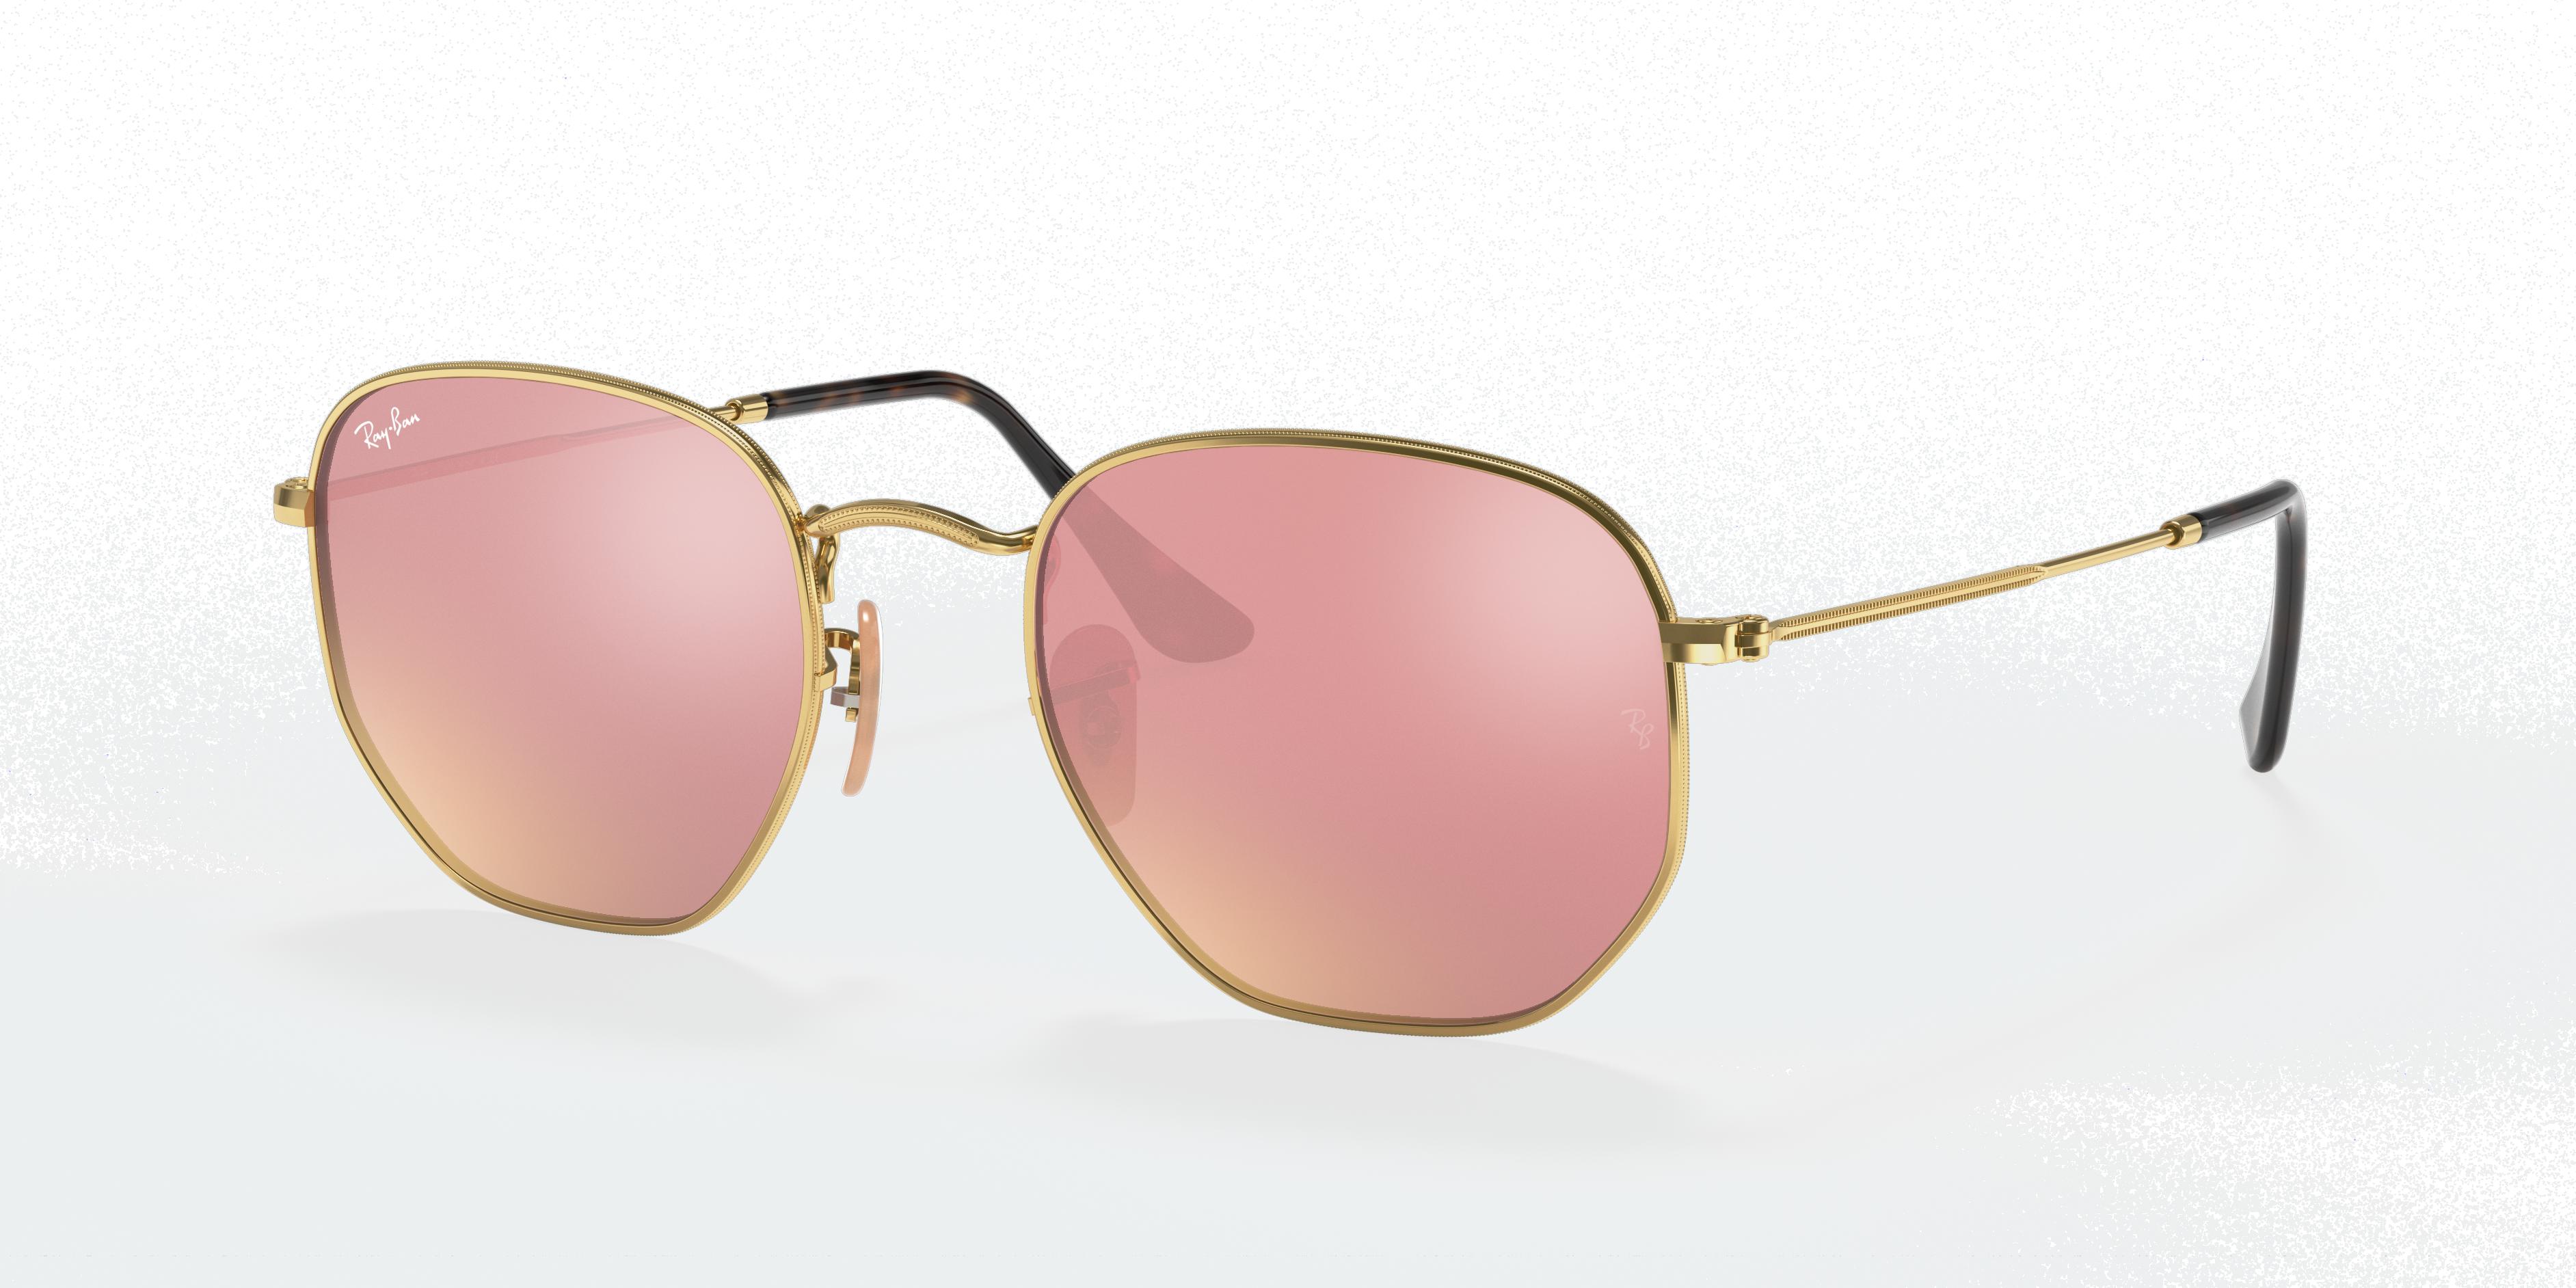 Ray-Ban Hexagonal Flat Lenses Gold, Pink Lenses - RB3548N